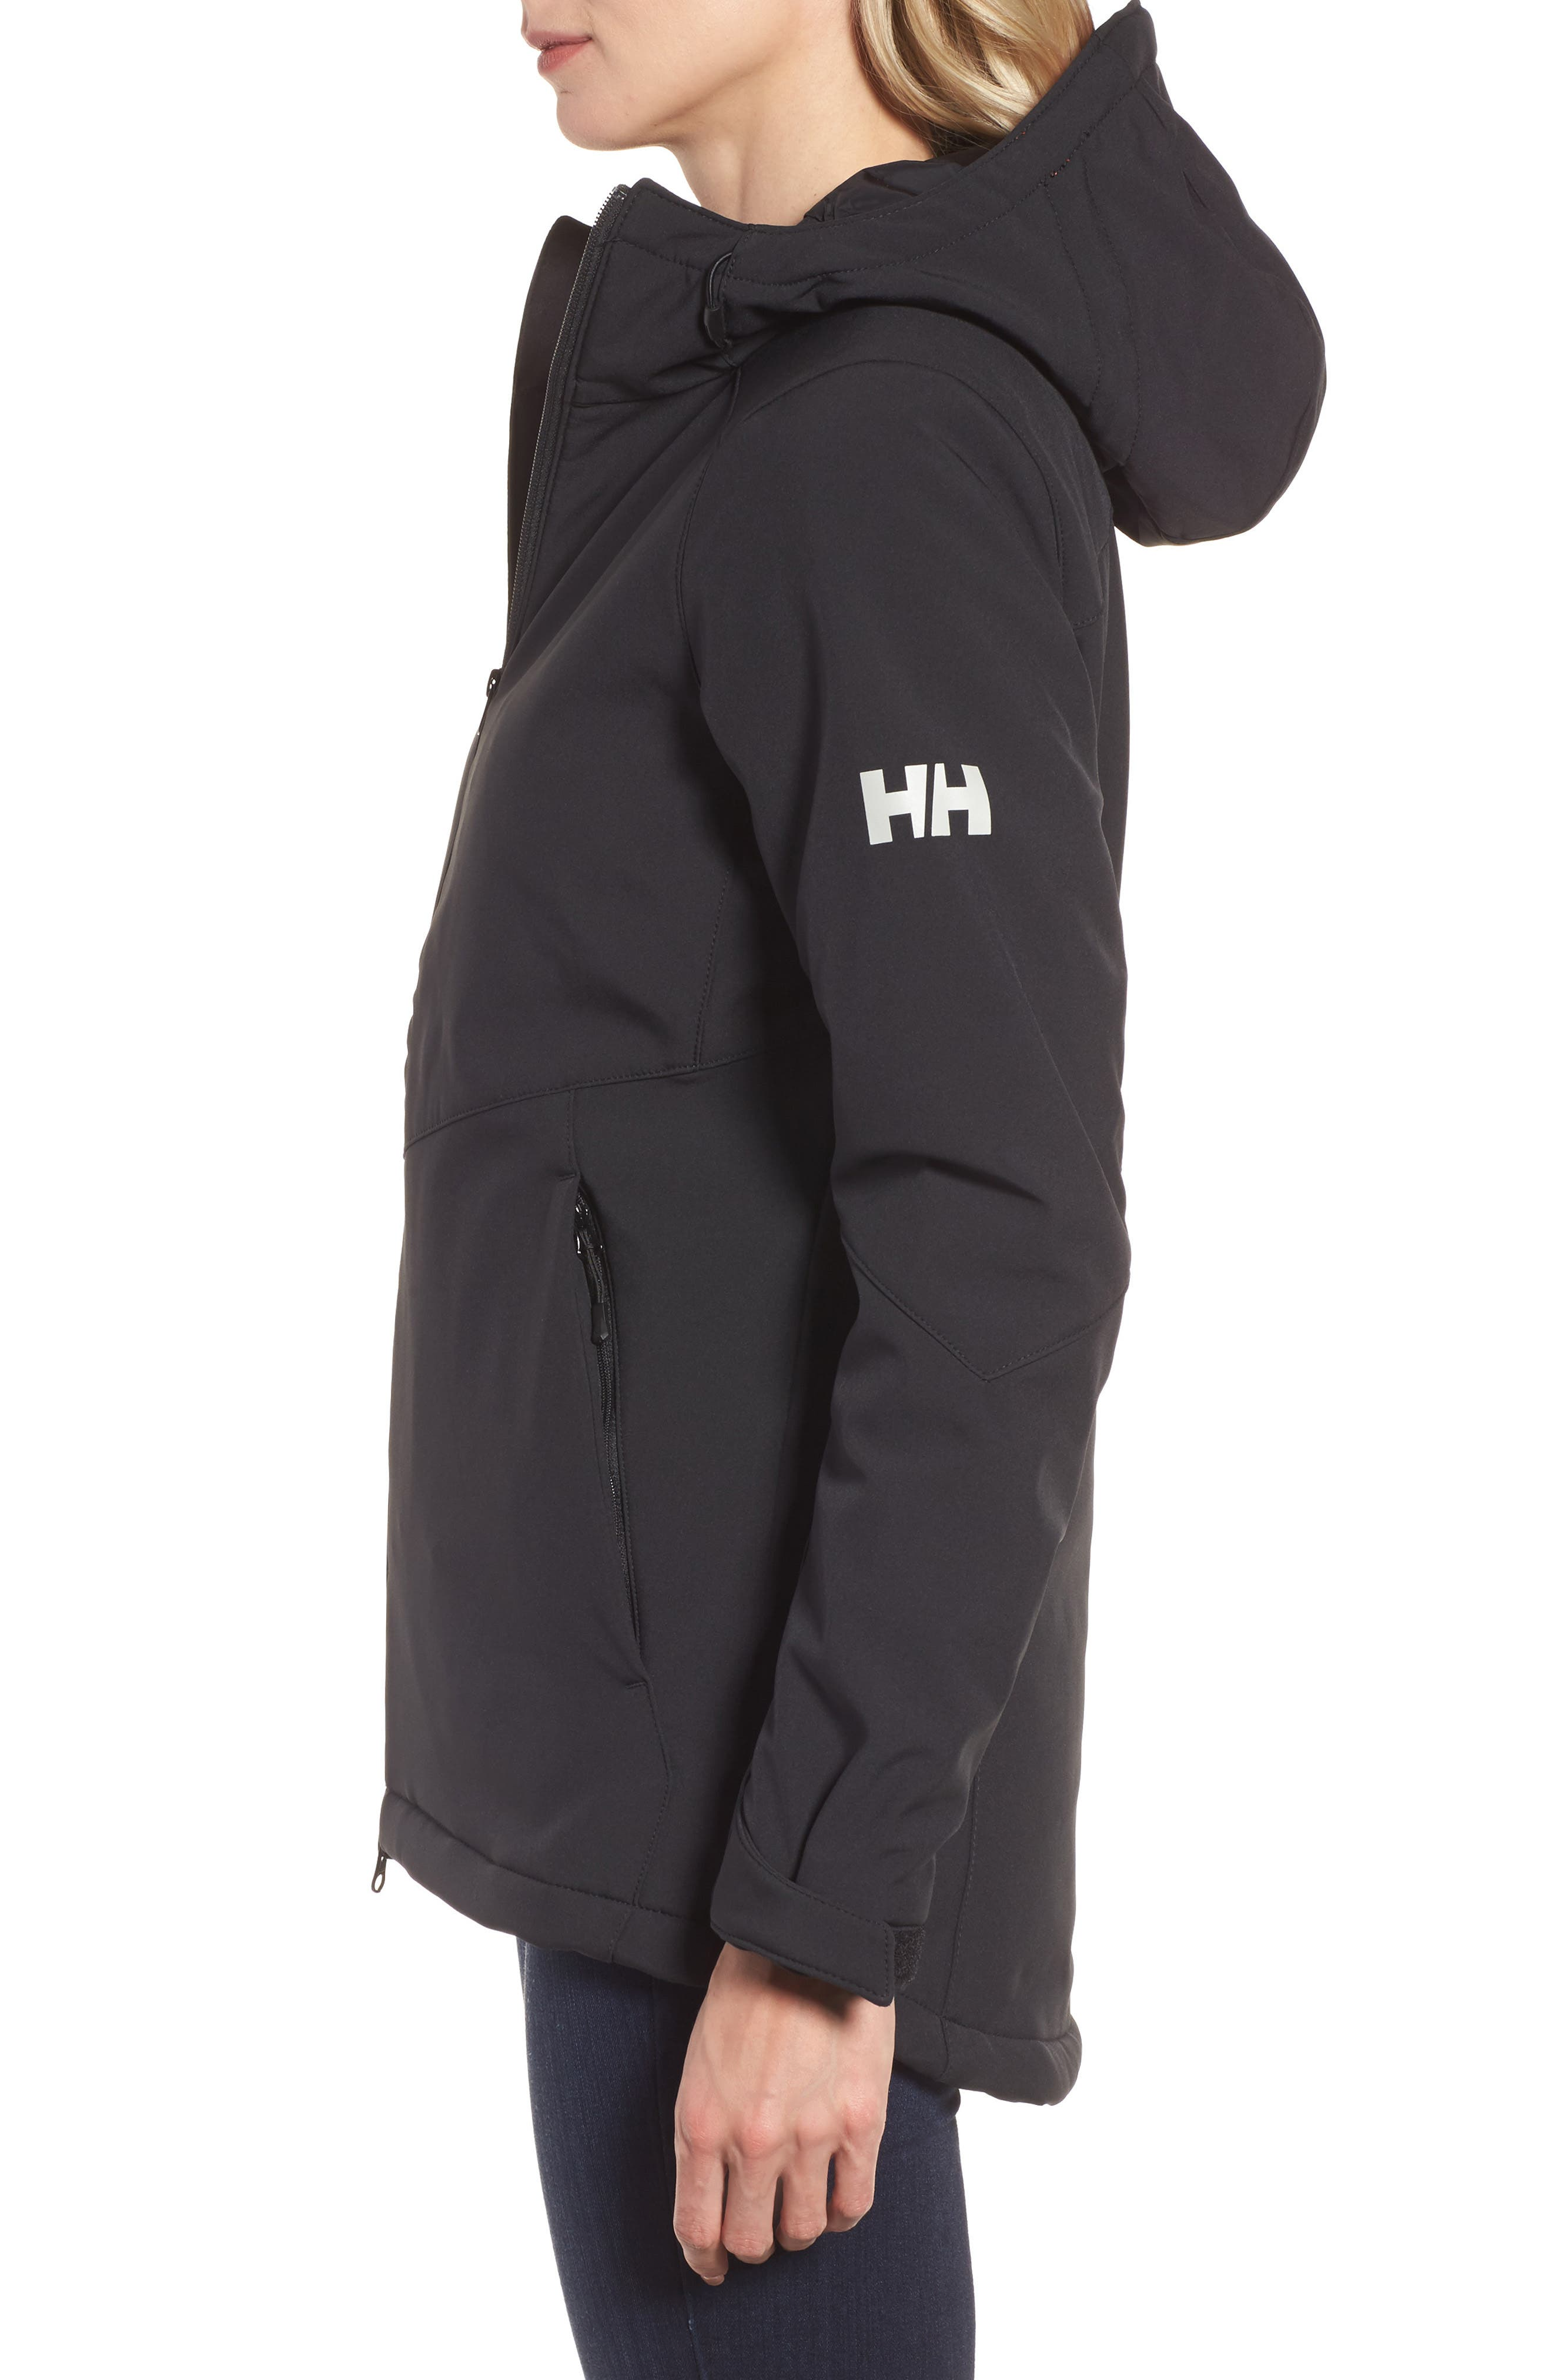 Lofn Hooded Insulated Soft Shell Jacket,                             Alternate thumbnail 3, color,                             Black